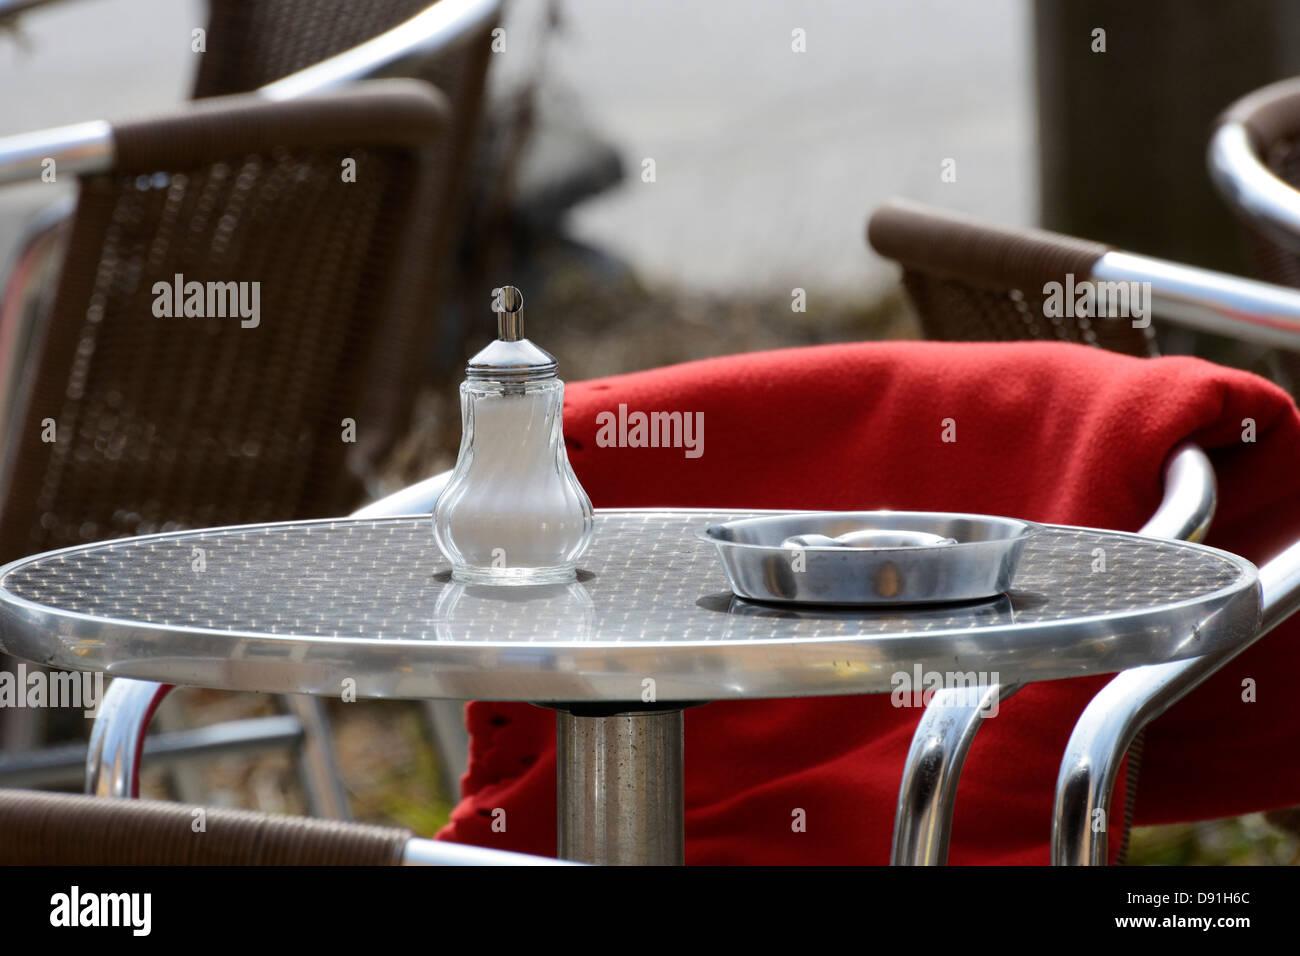 Cafe Table Stockfotos & Cafe Table Bilder - Alamy